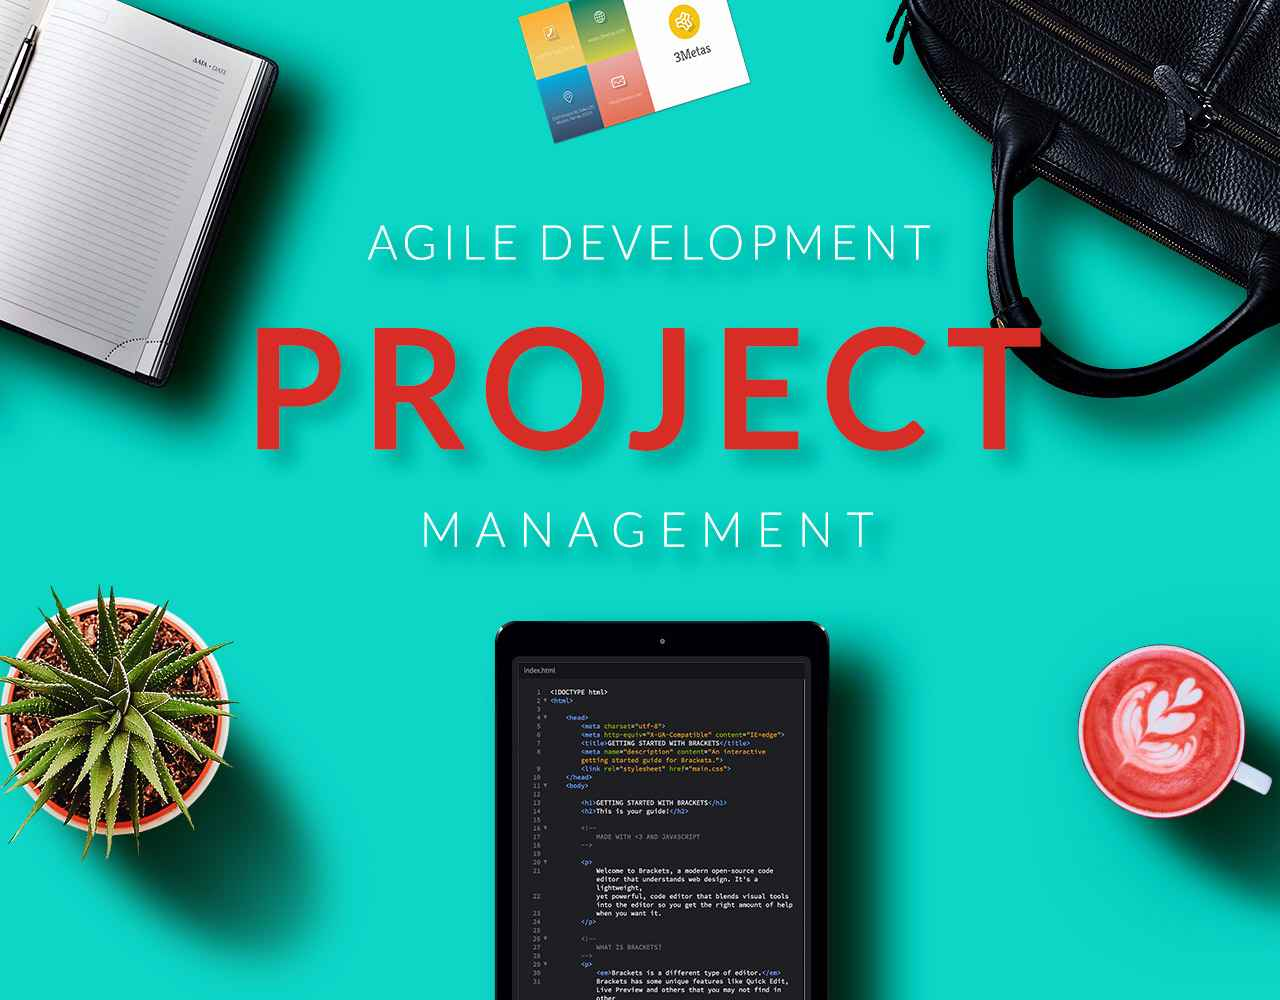 Agile Development Service Home Page 3Metas